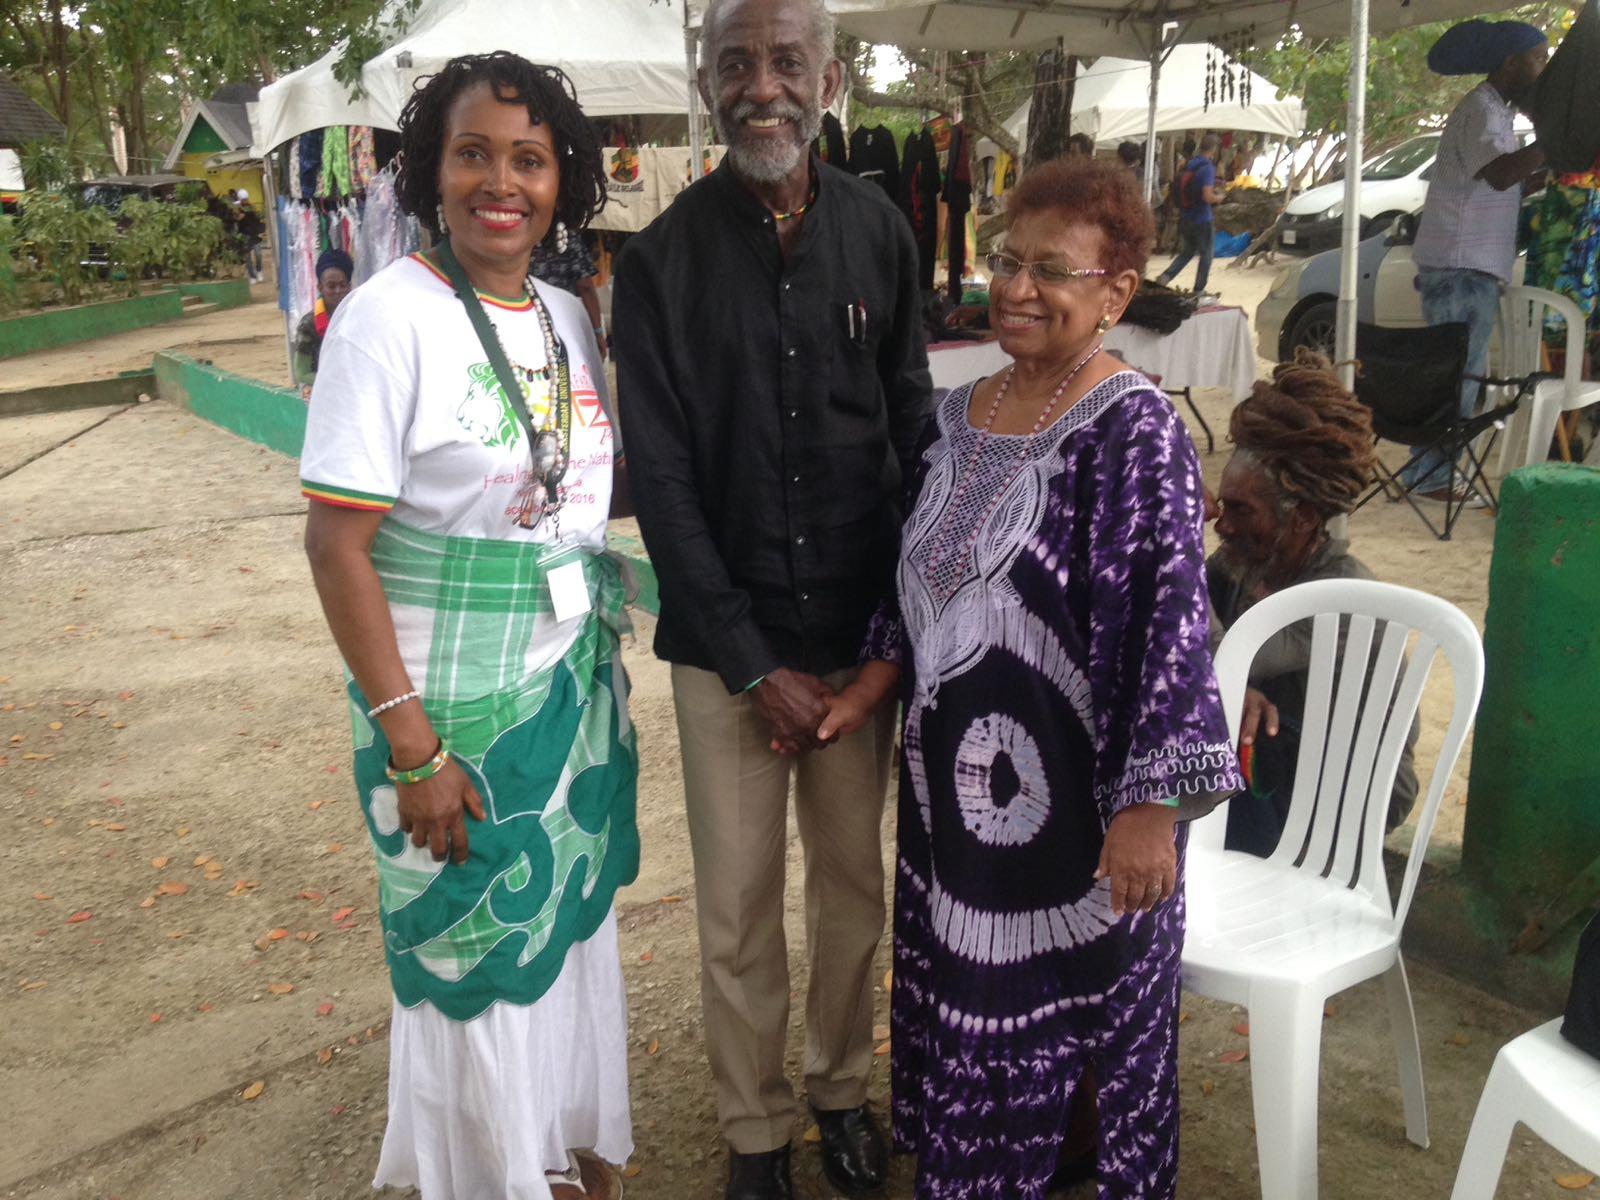 Fwd: Rastafari InInity/RootzFest, a leader in the Ganja Knowledgeindustry in Jamaica 1